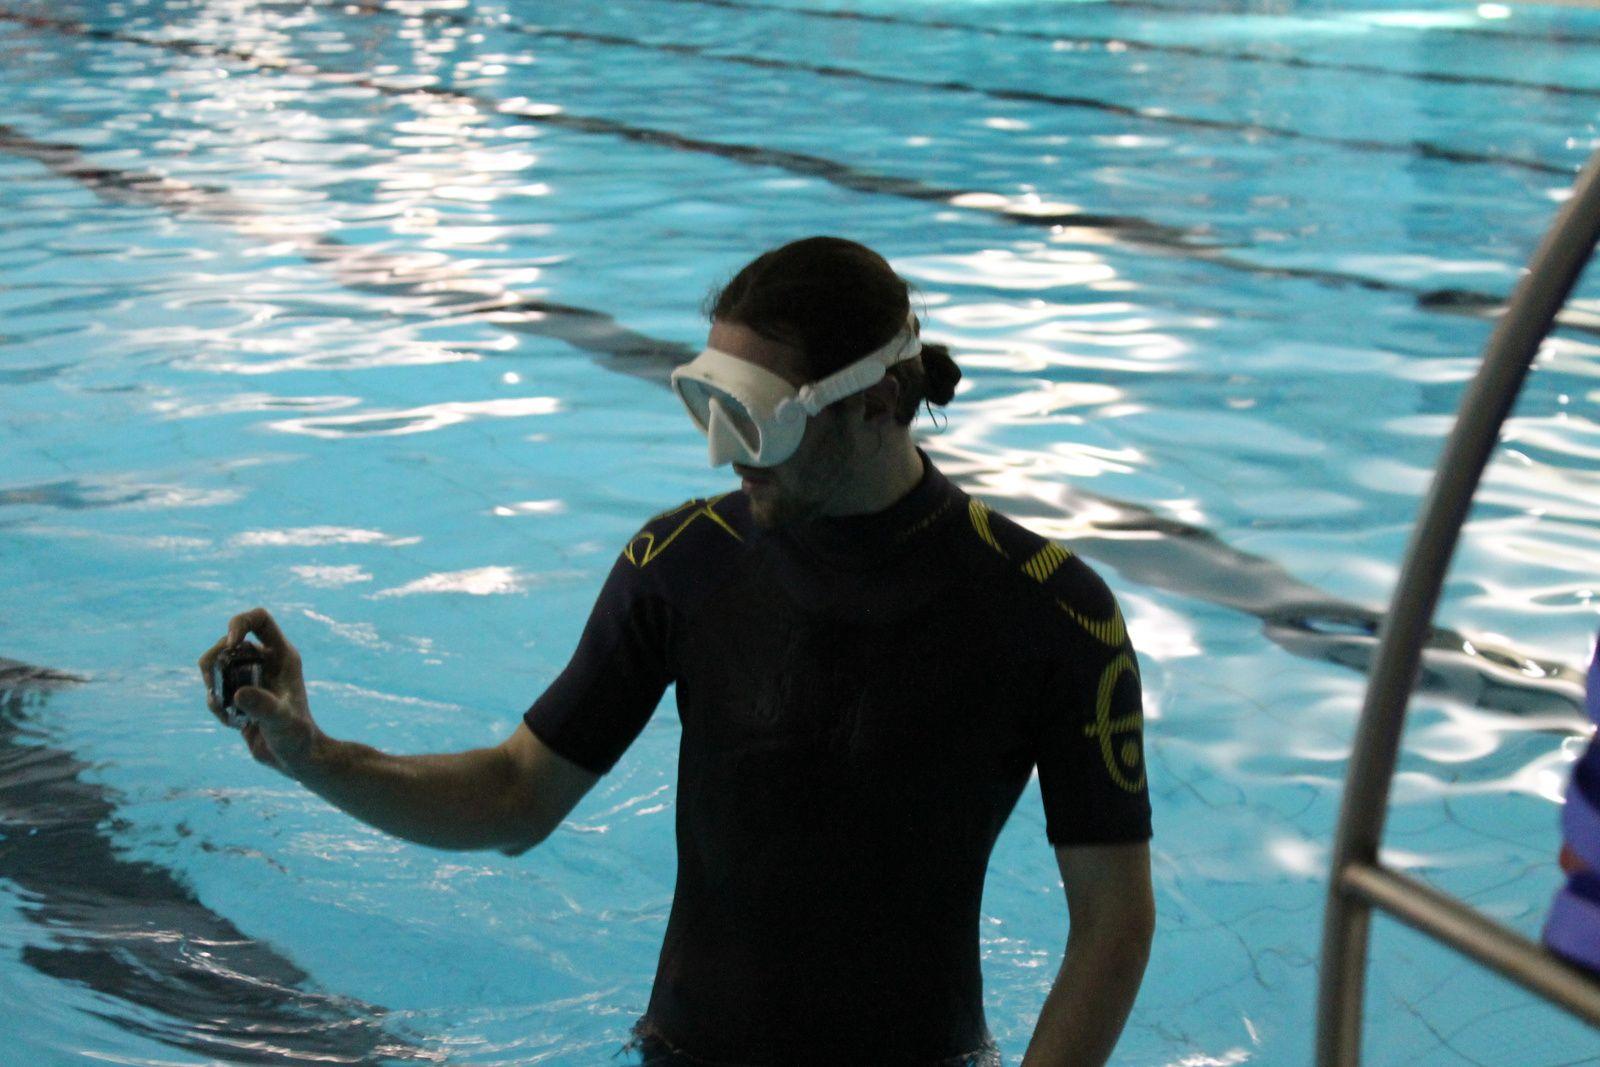 The freediver-film-maker :-) (Photo by Tony De Wilde).